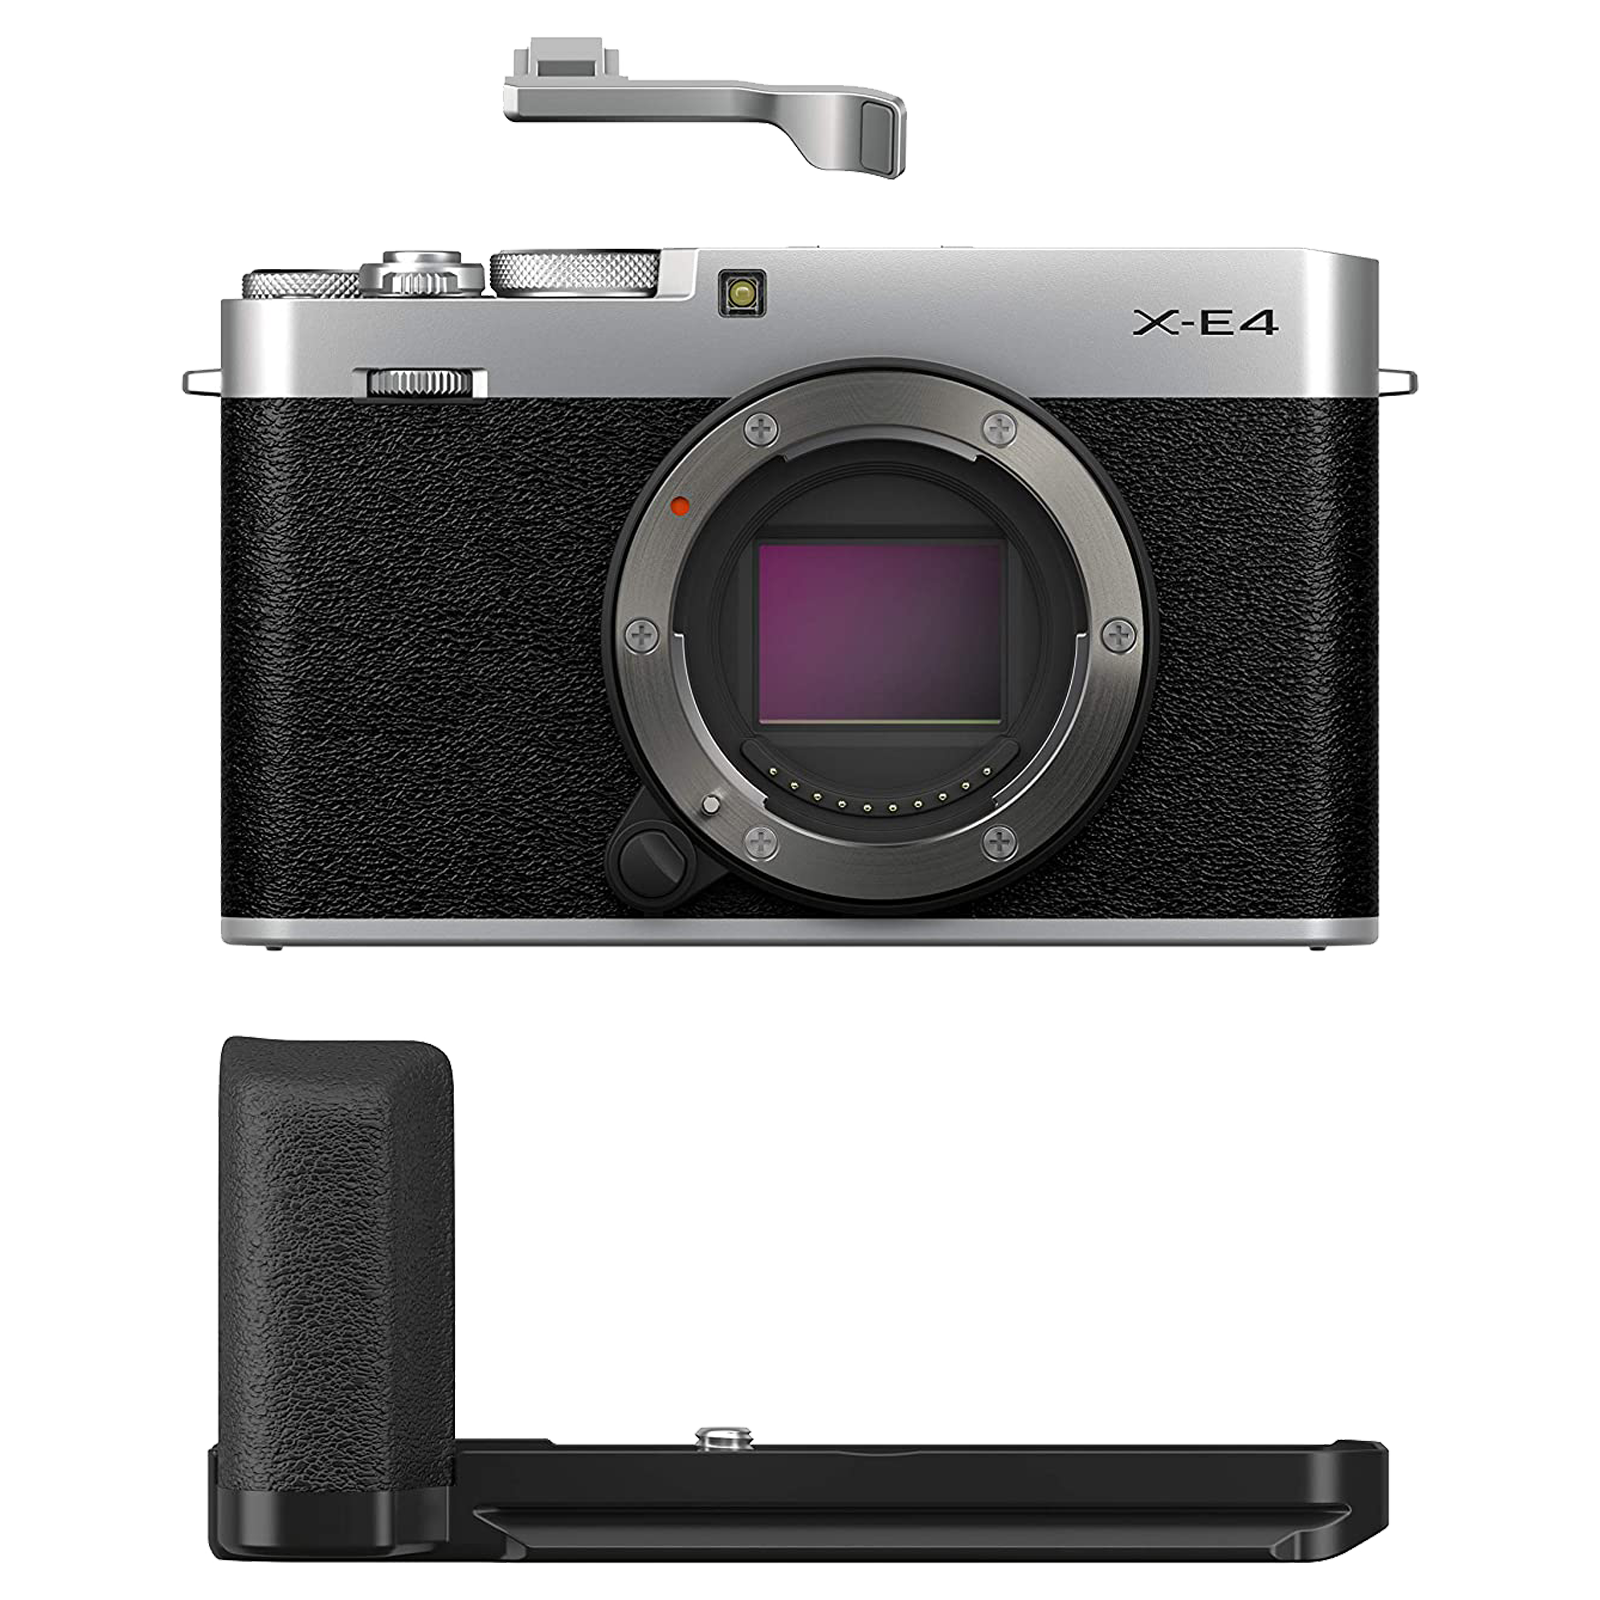 Fujifilm X-E4 26.1MP Mirrorless Camera (180 Degree Tilting LCD Screen, Silver)_1